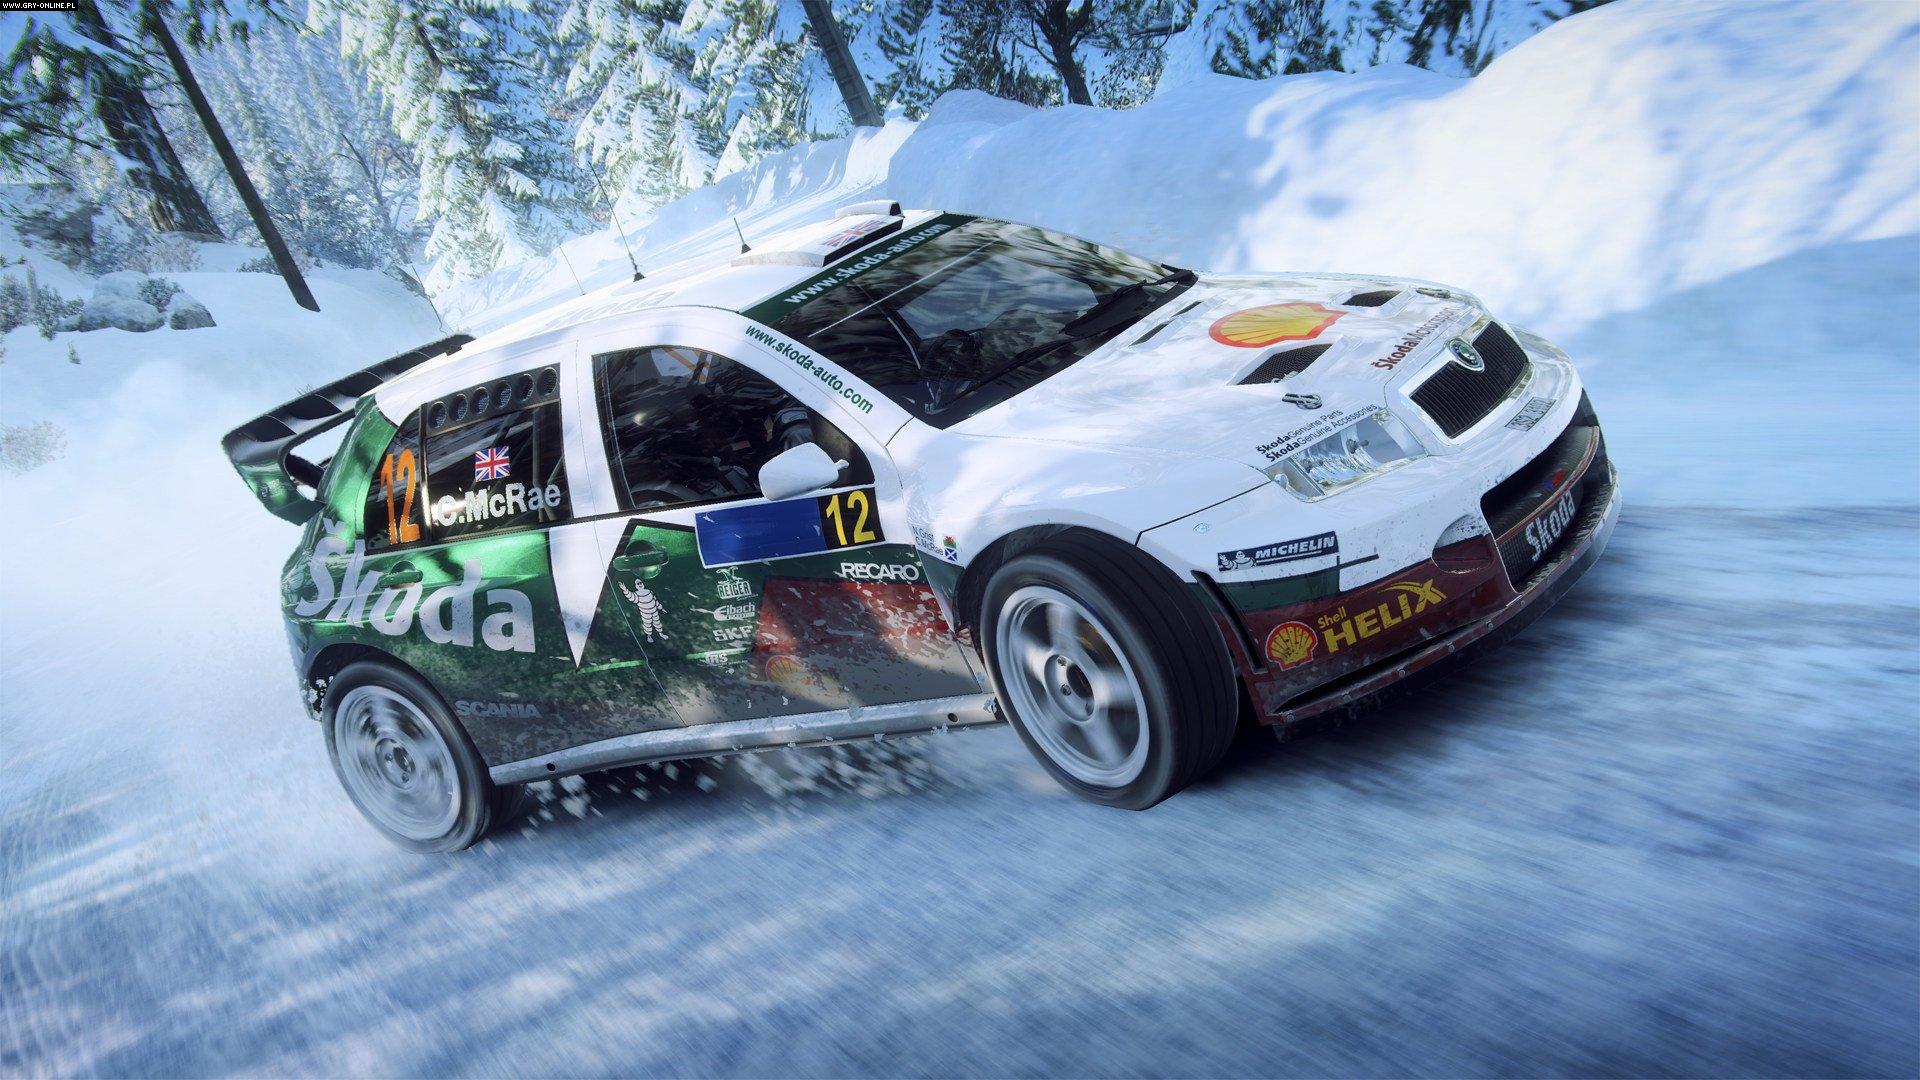 DiRT Rally 2.0 PC, PS4, XONE Games Image 3/49, Codemasters Software